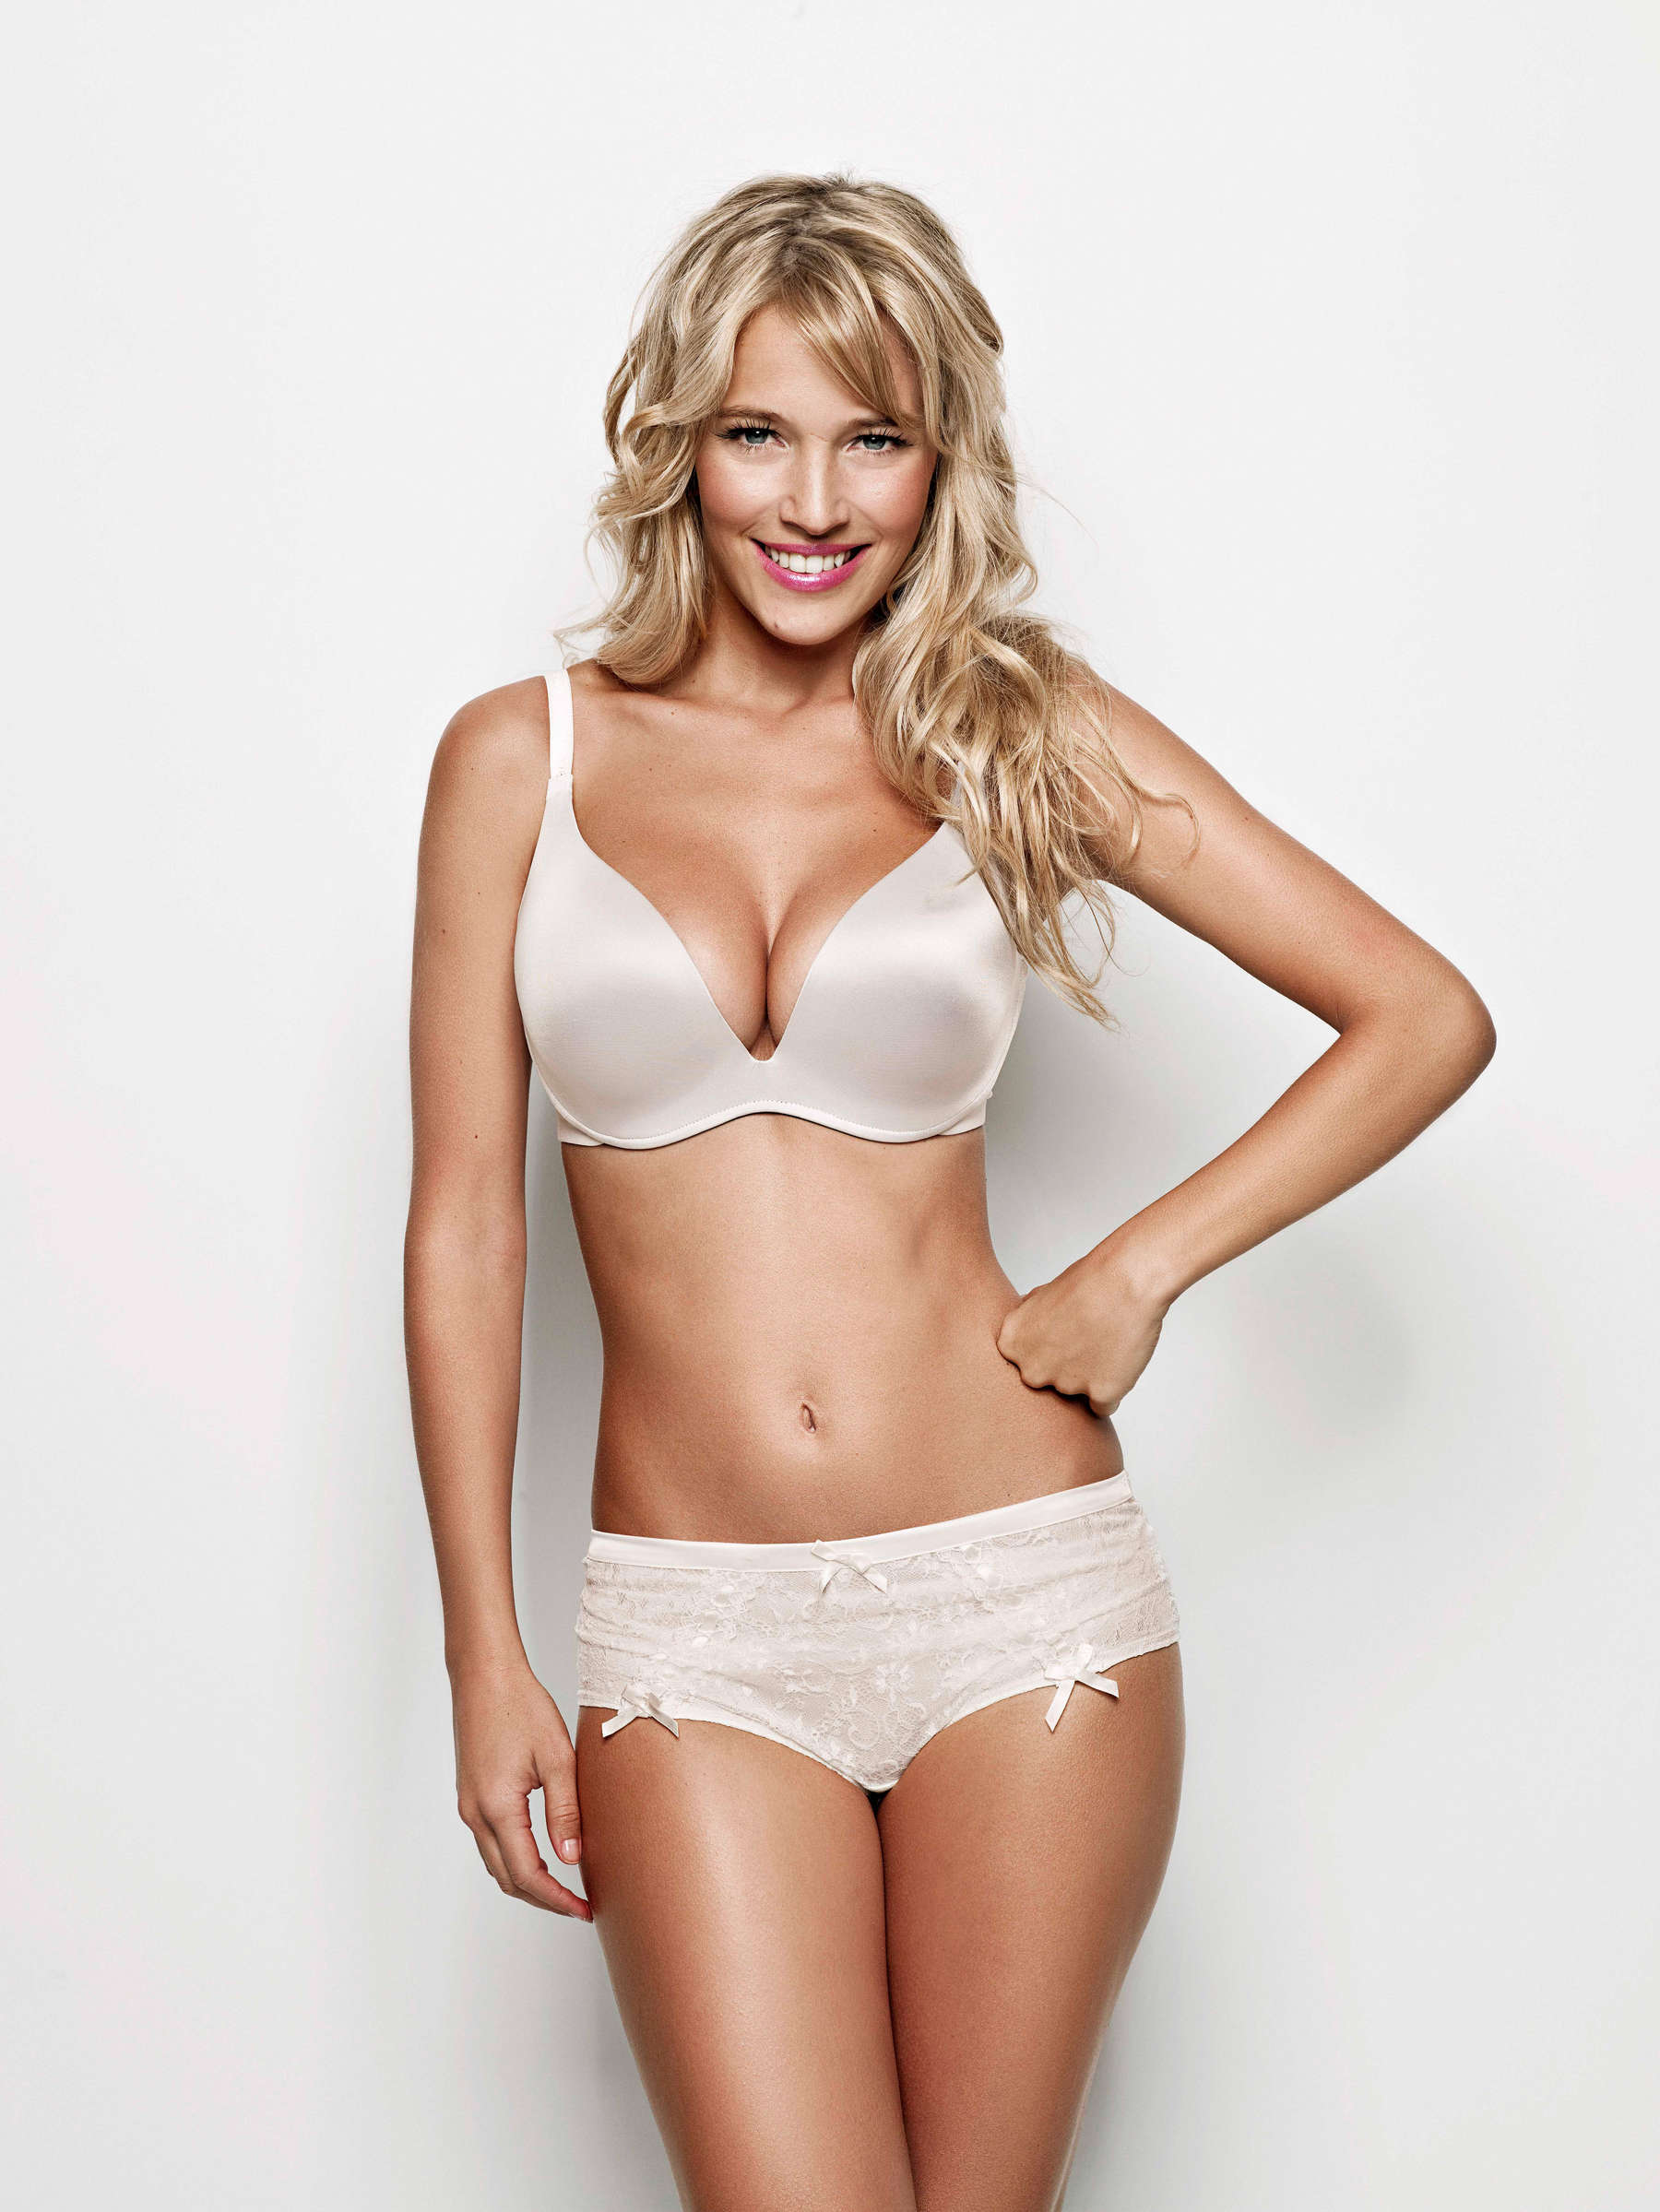 Luisana Lopilato sexy abs